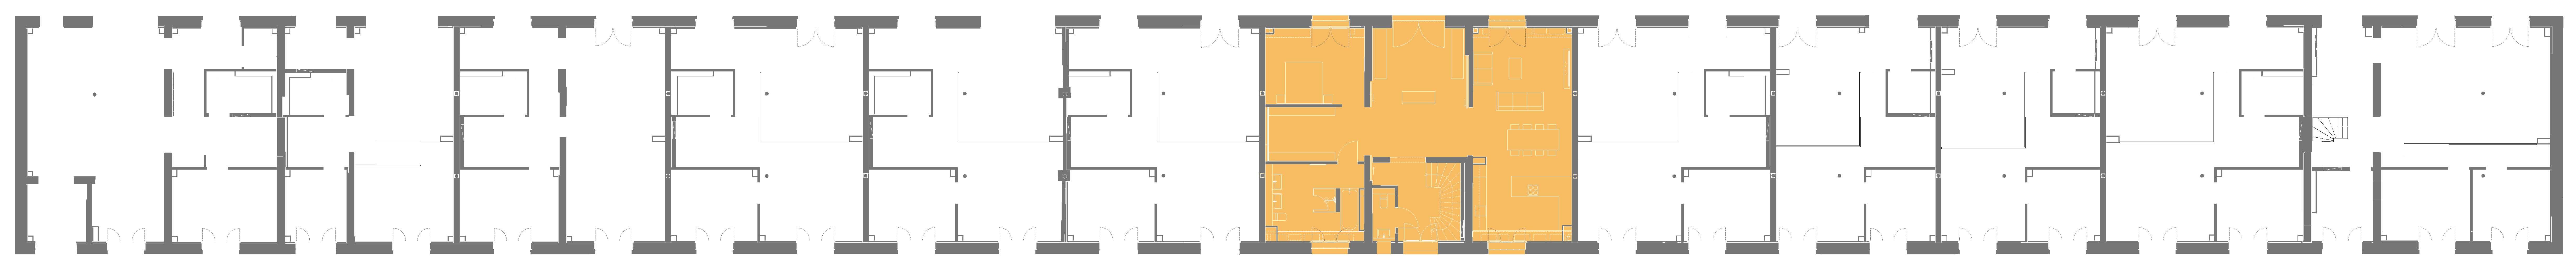 Lageplan der Remise Stadthaus 6